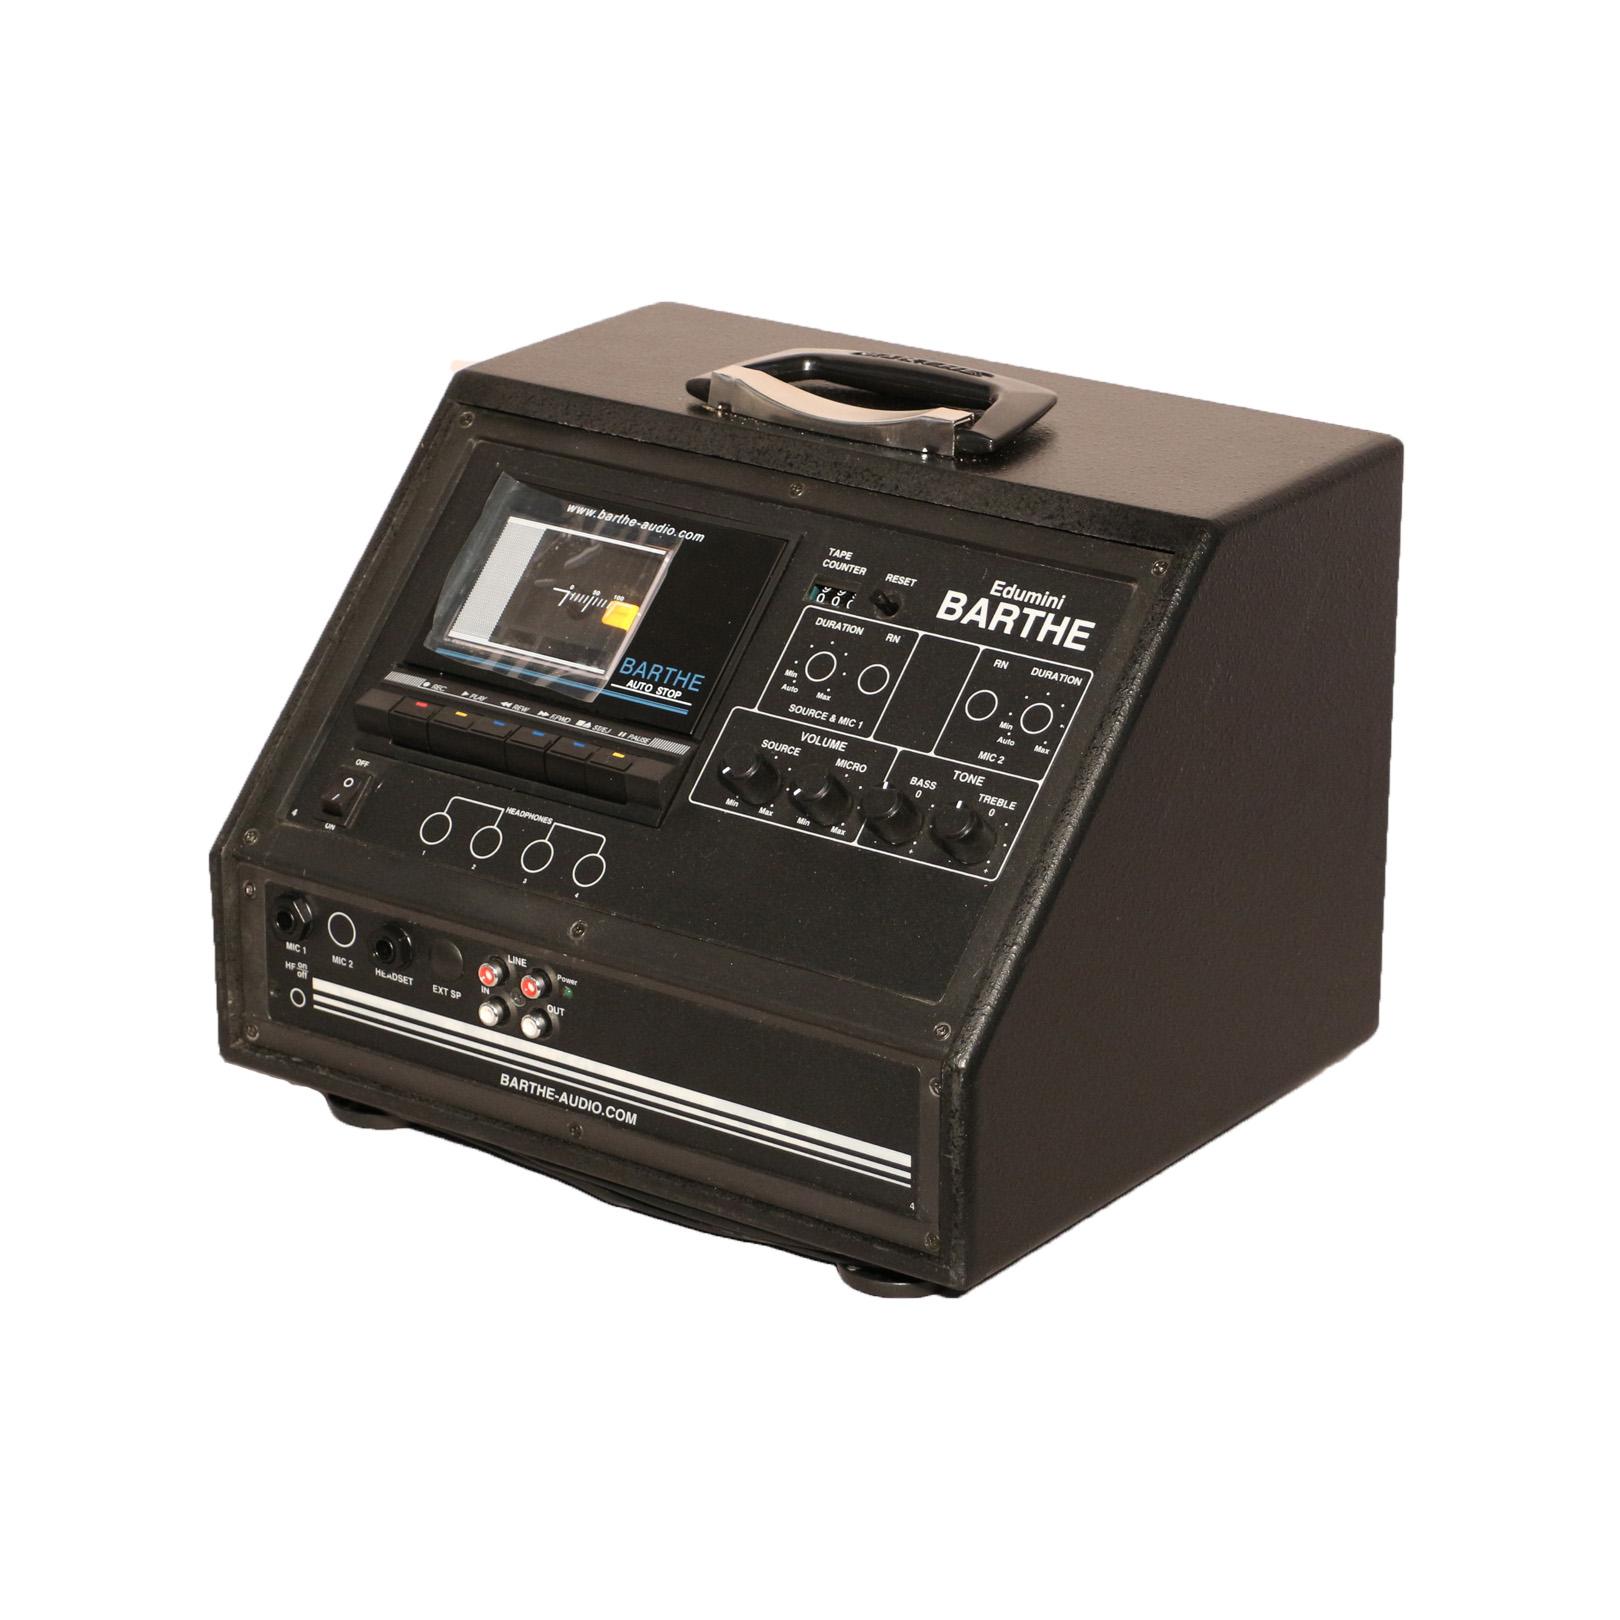 ed 001 edumini cassette lect cassette 23 watt rms barthe. Black Bedroom Furniture Sets. Home Design Ideas